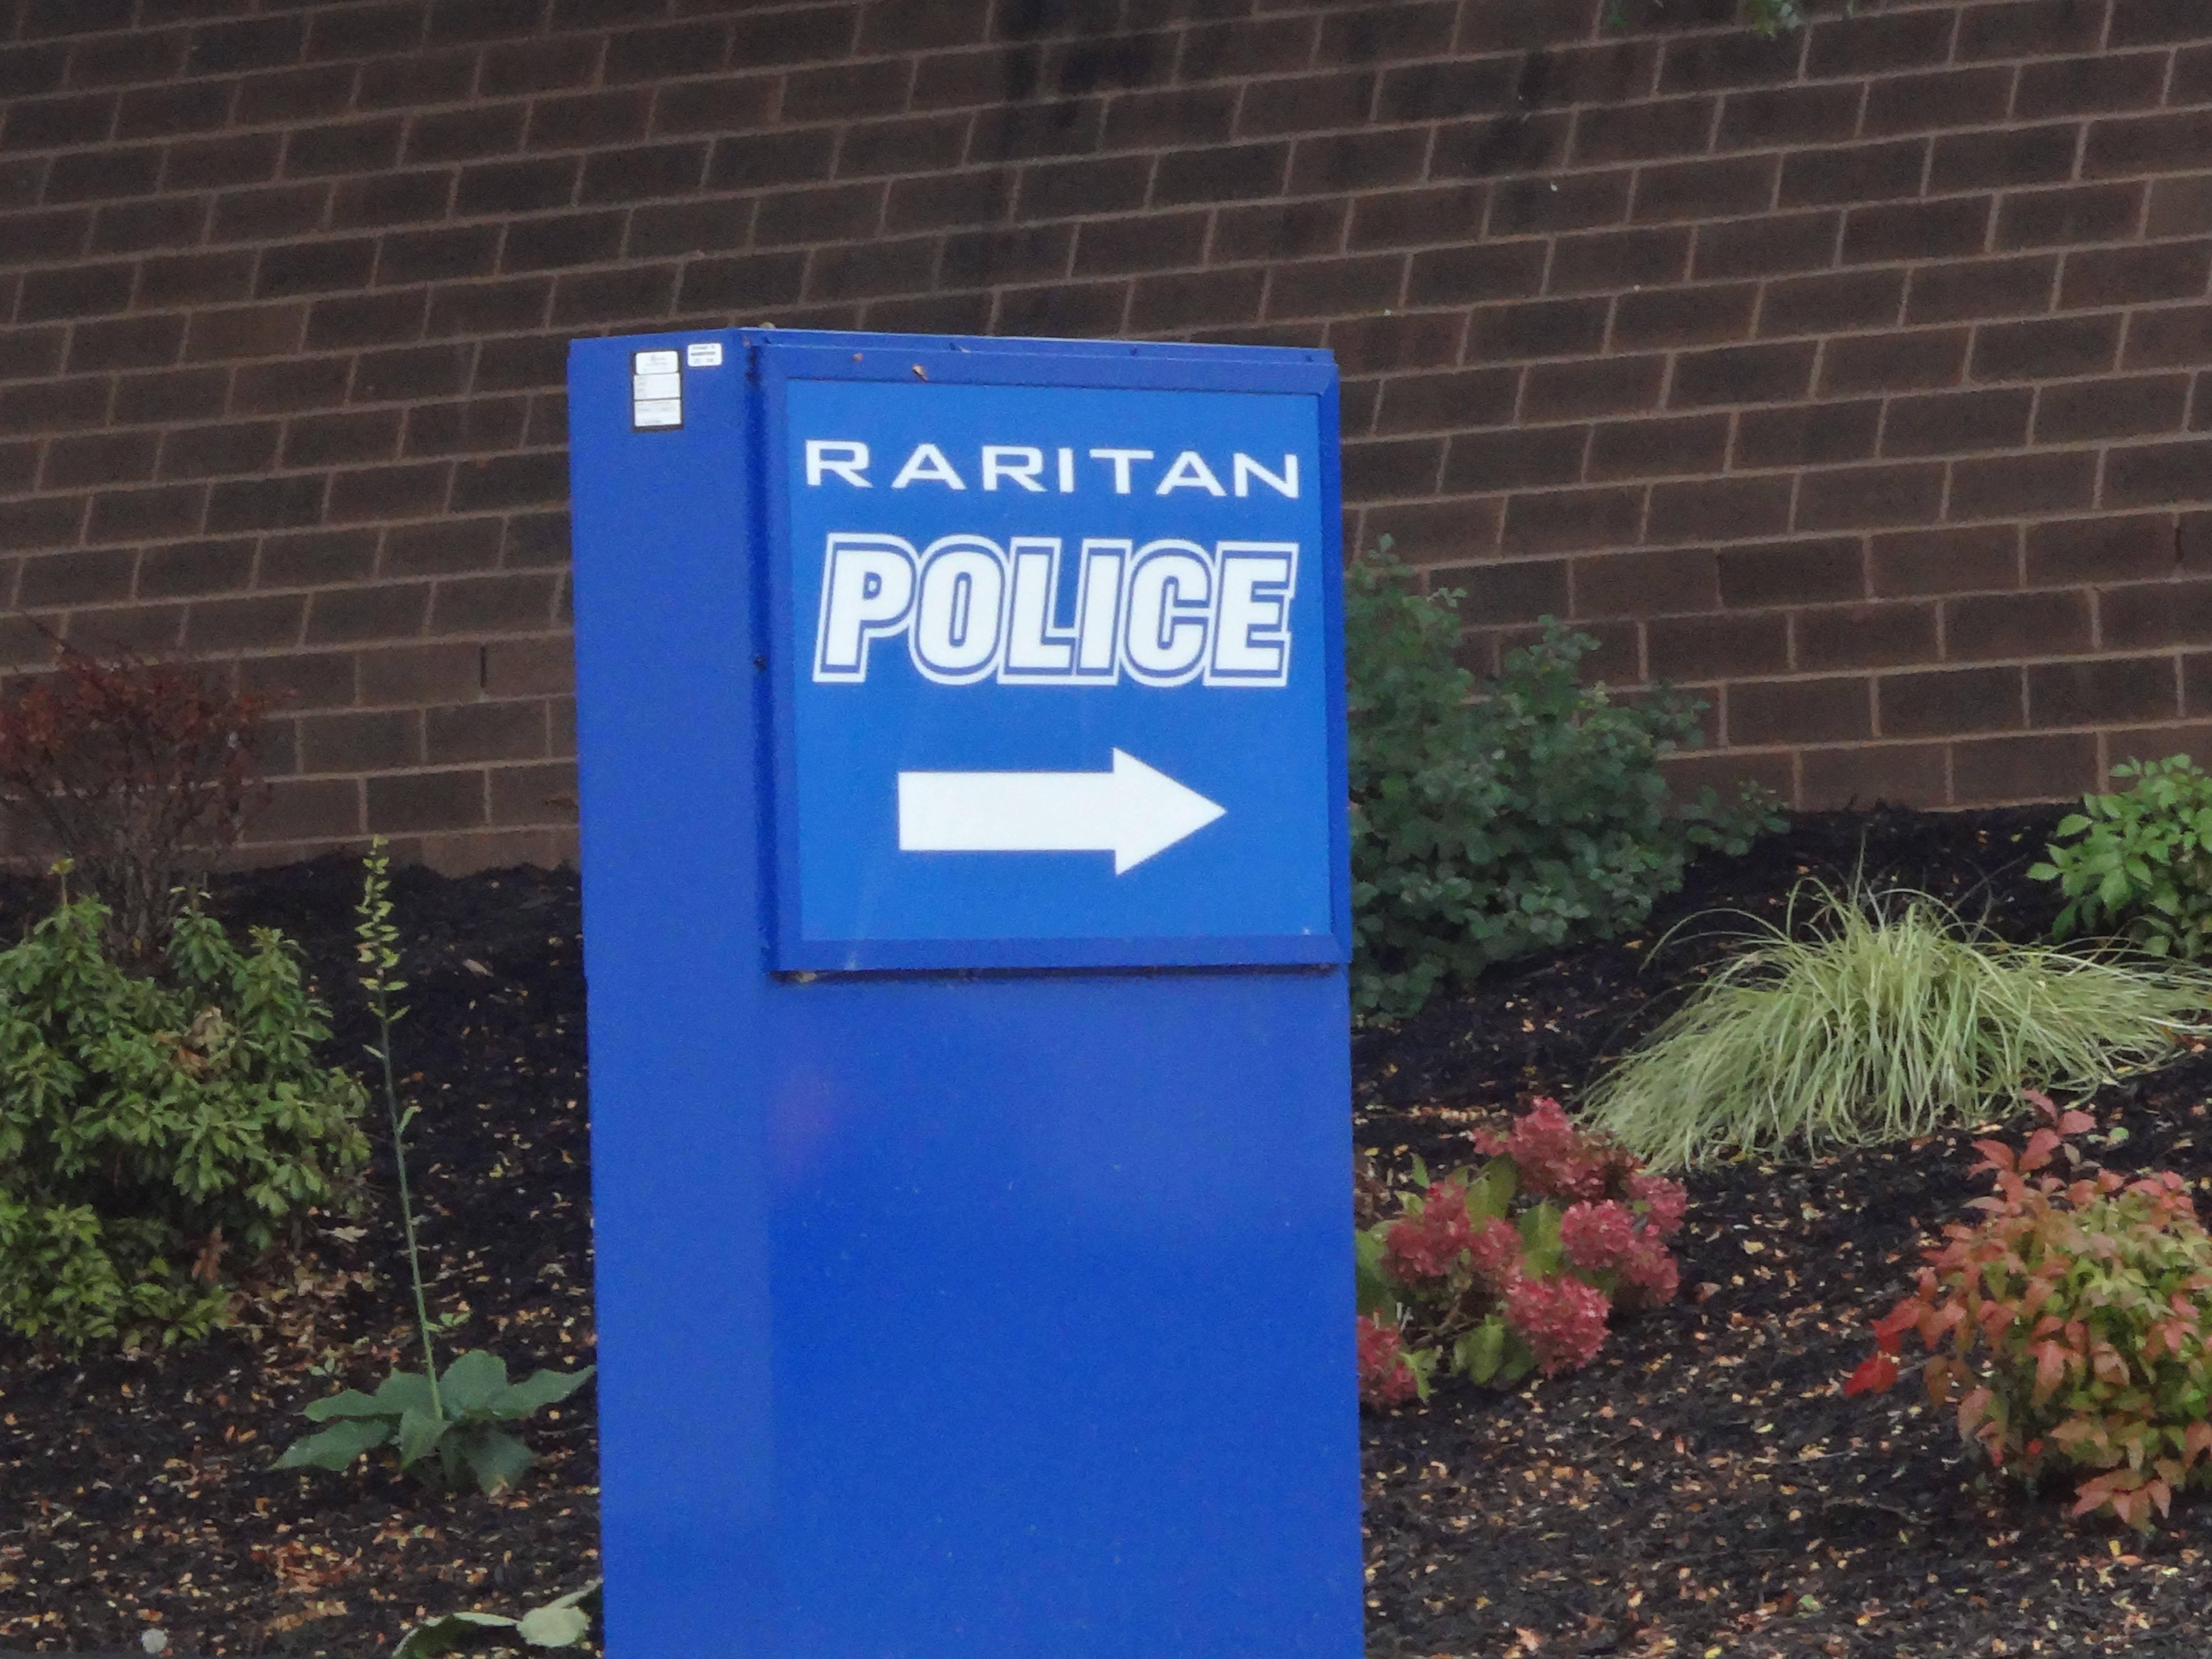 38079df63f29fcdf630c_Raritan_Police.jpg